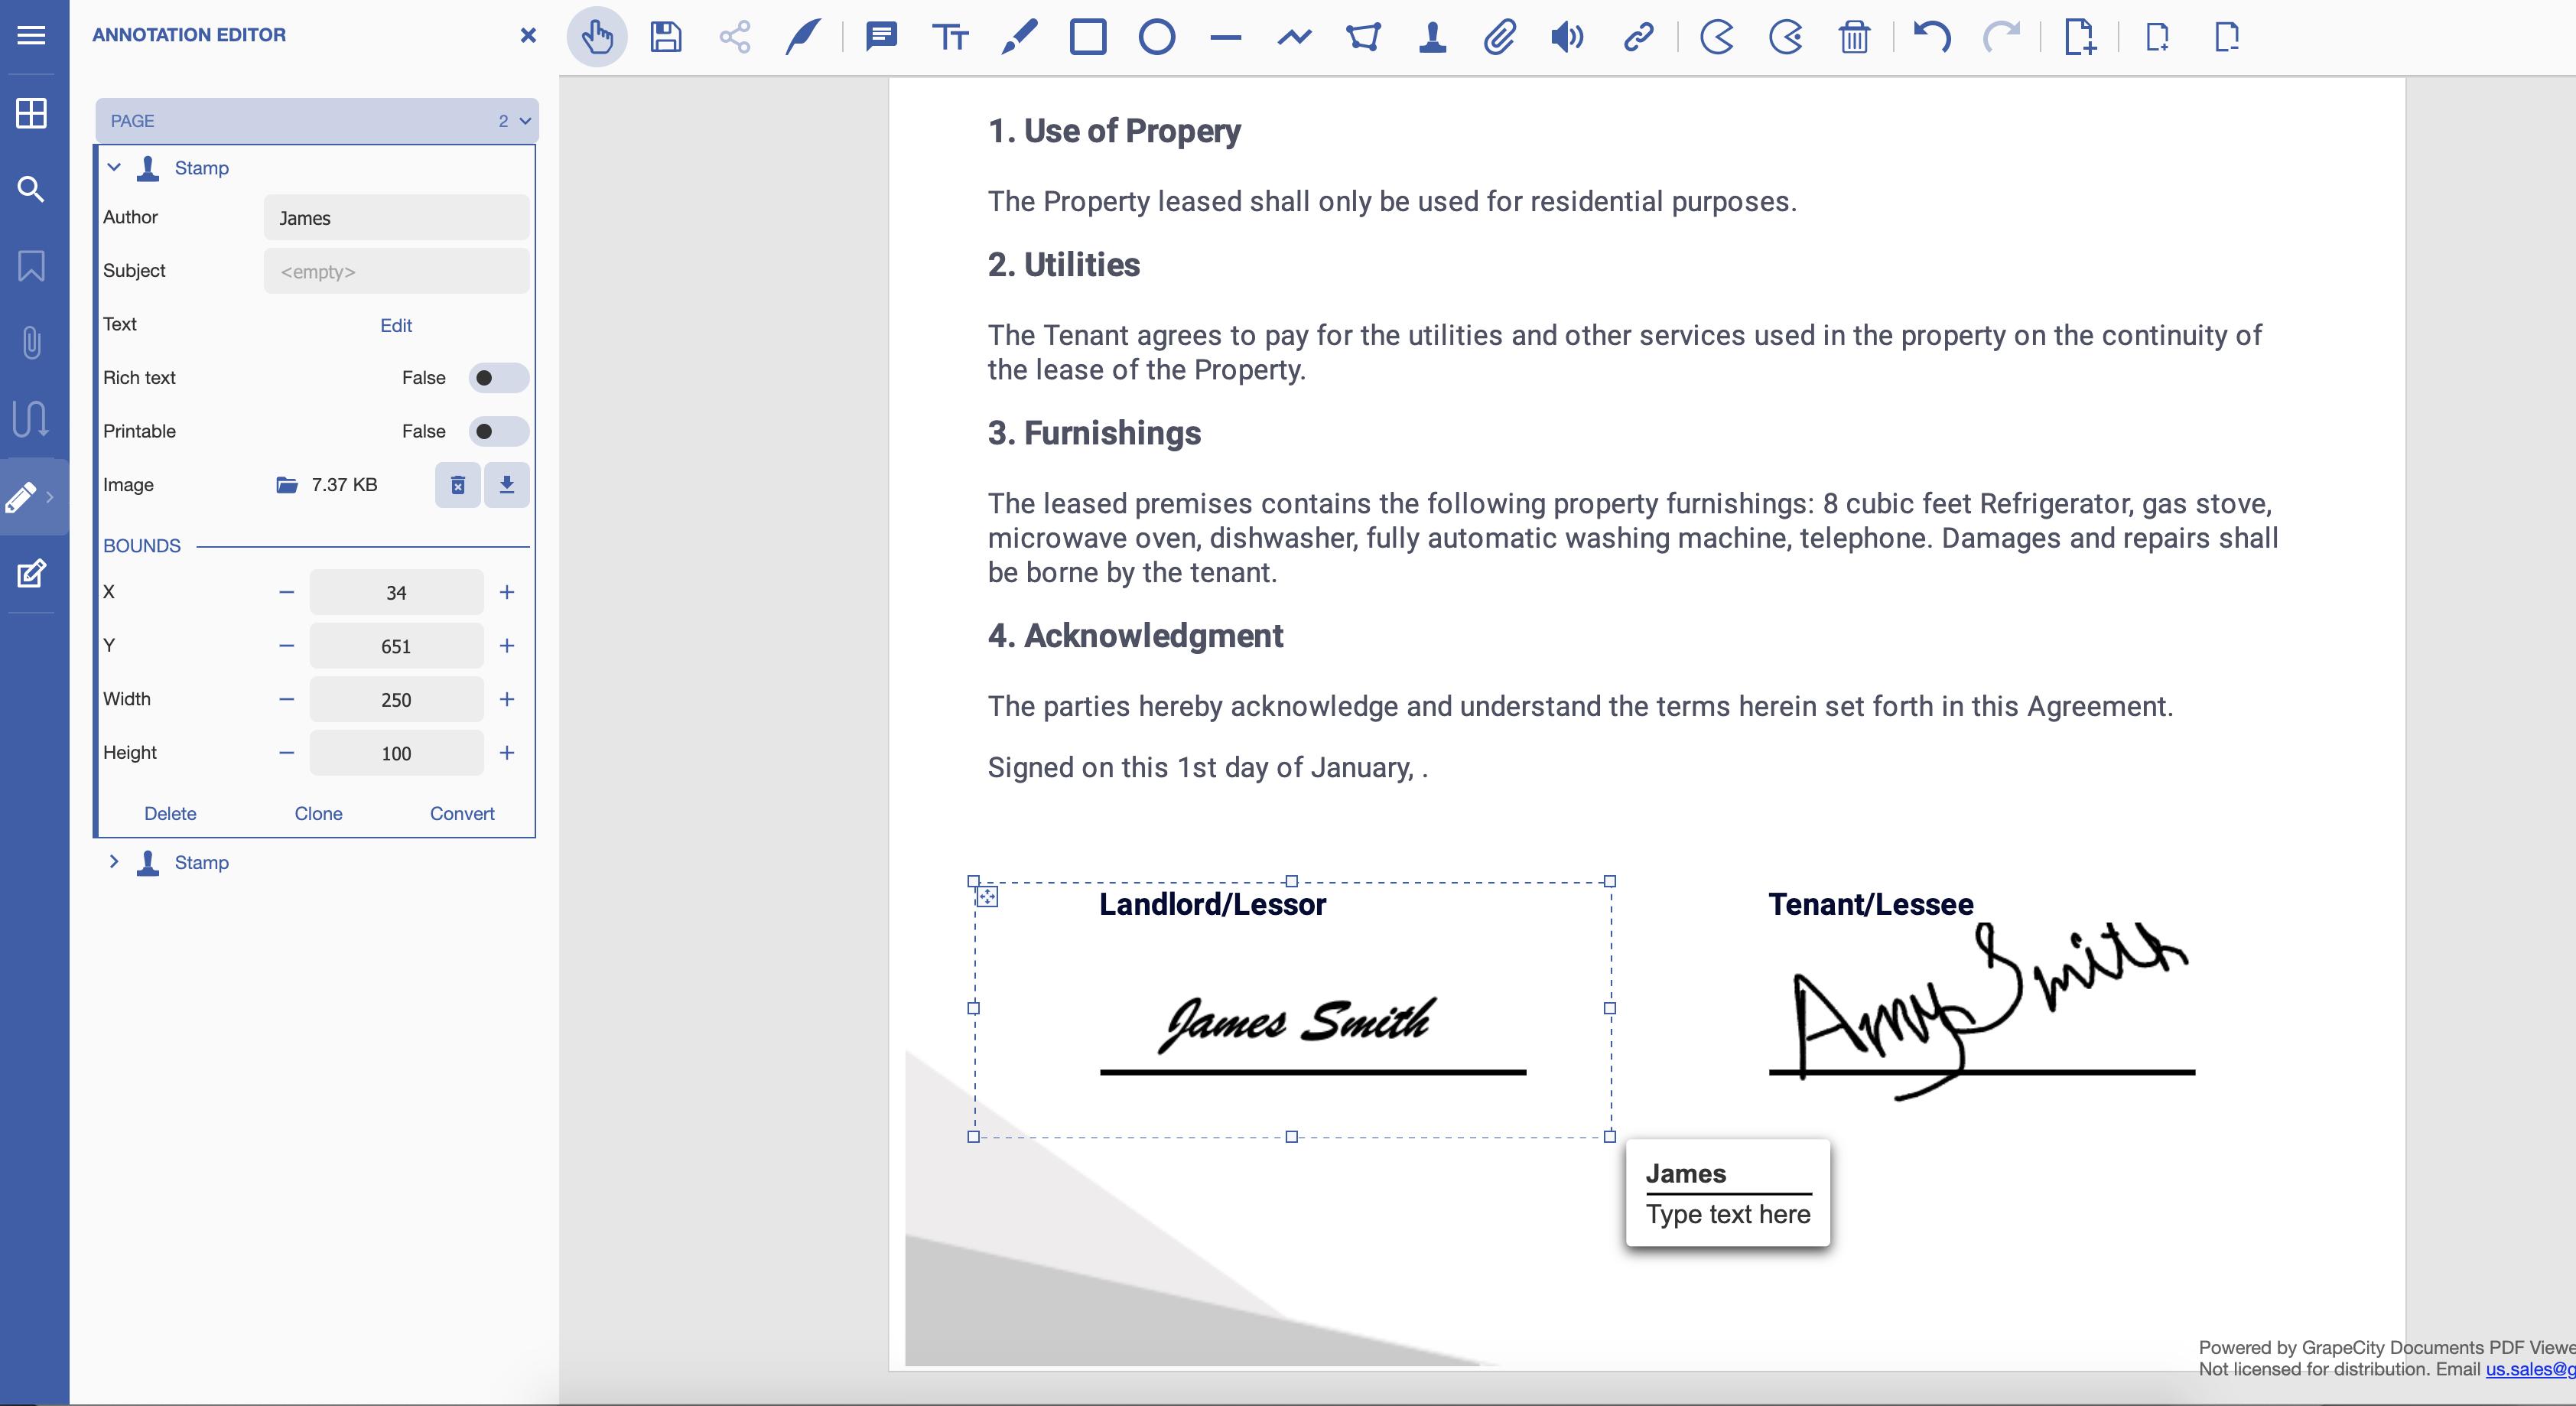 SignatureProperties